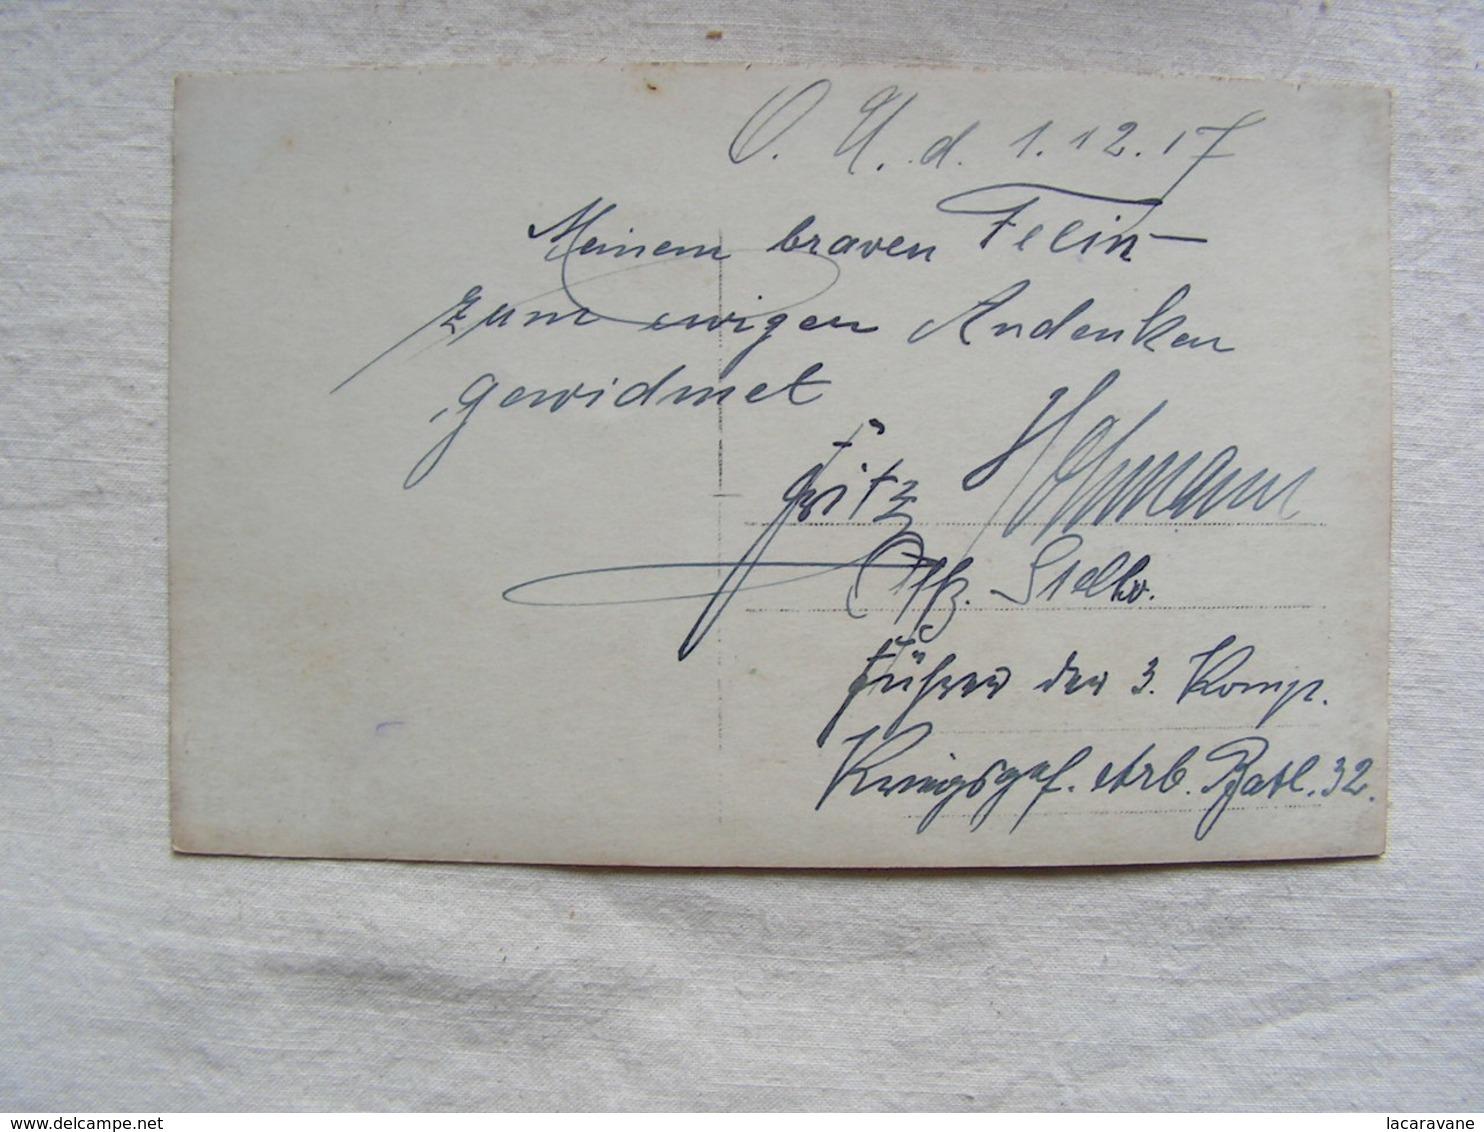 Ww1 Weltkrieg Carte Photo Soldat Allemand Dans Caleche Attelage Pilote ? Avion 151 - Guerre 1914-18